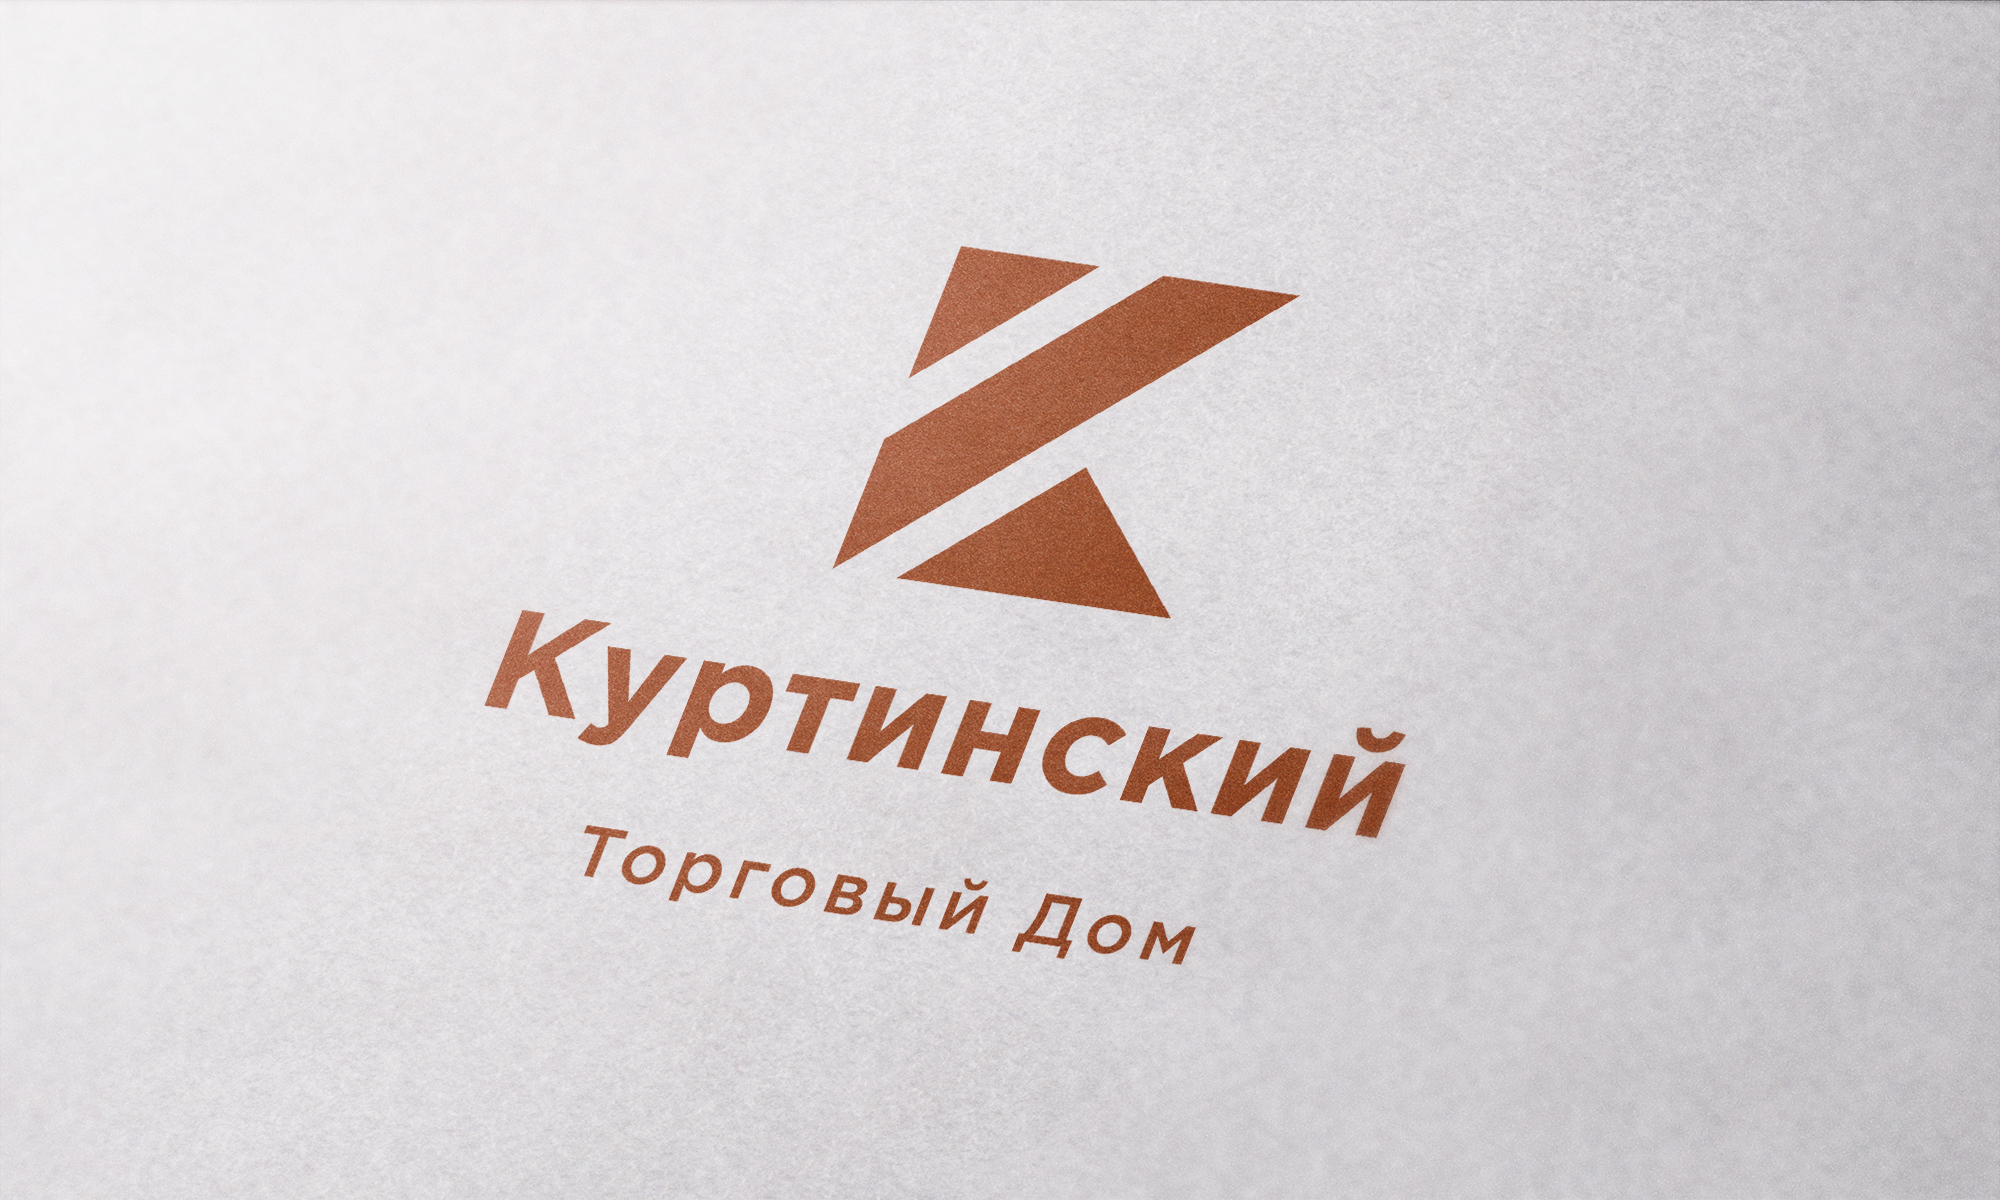 Логотип для камнедобывающей компании фото f_3085b9ea44054bad.jpg